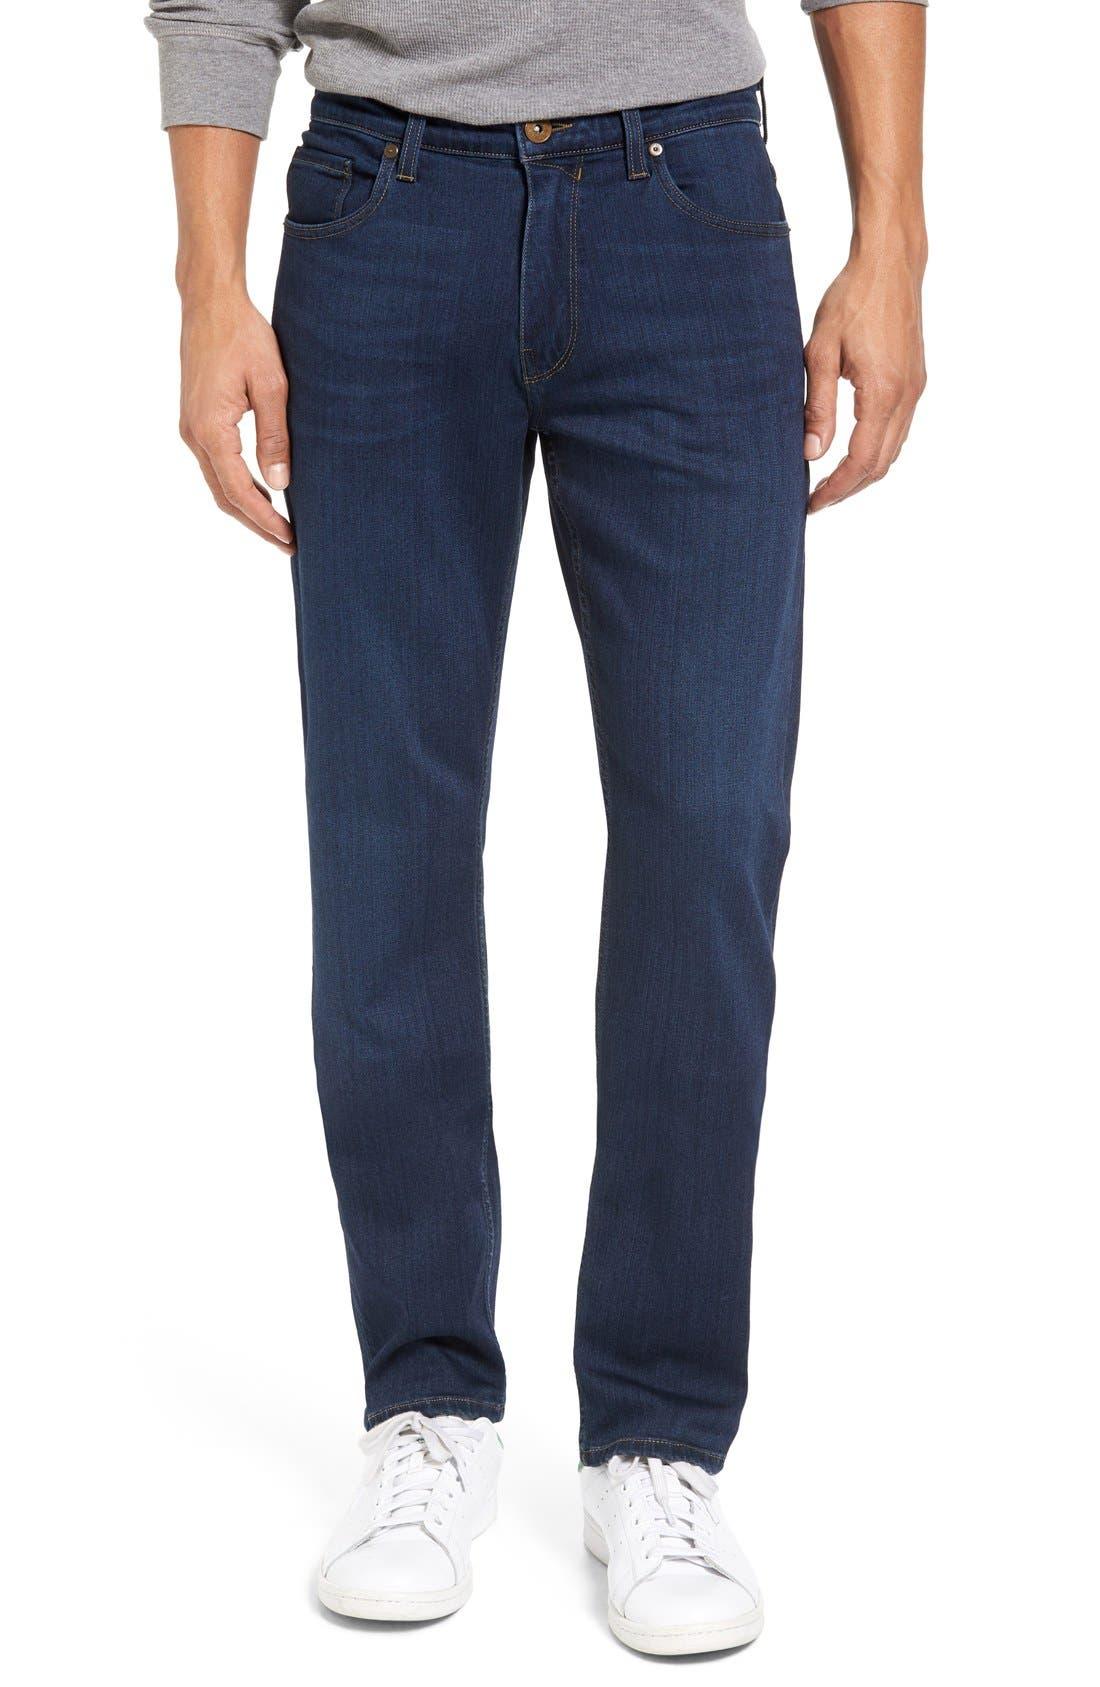 Alternate Image 1 Selected - PAIGE Transcend - Federal Slim Straight Leg Jeans (Scott)